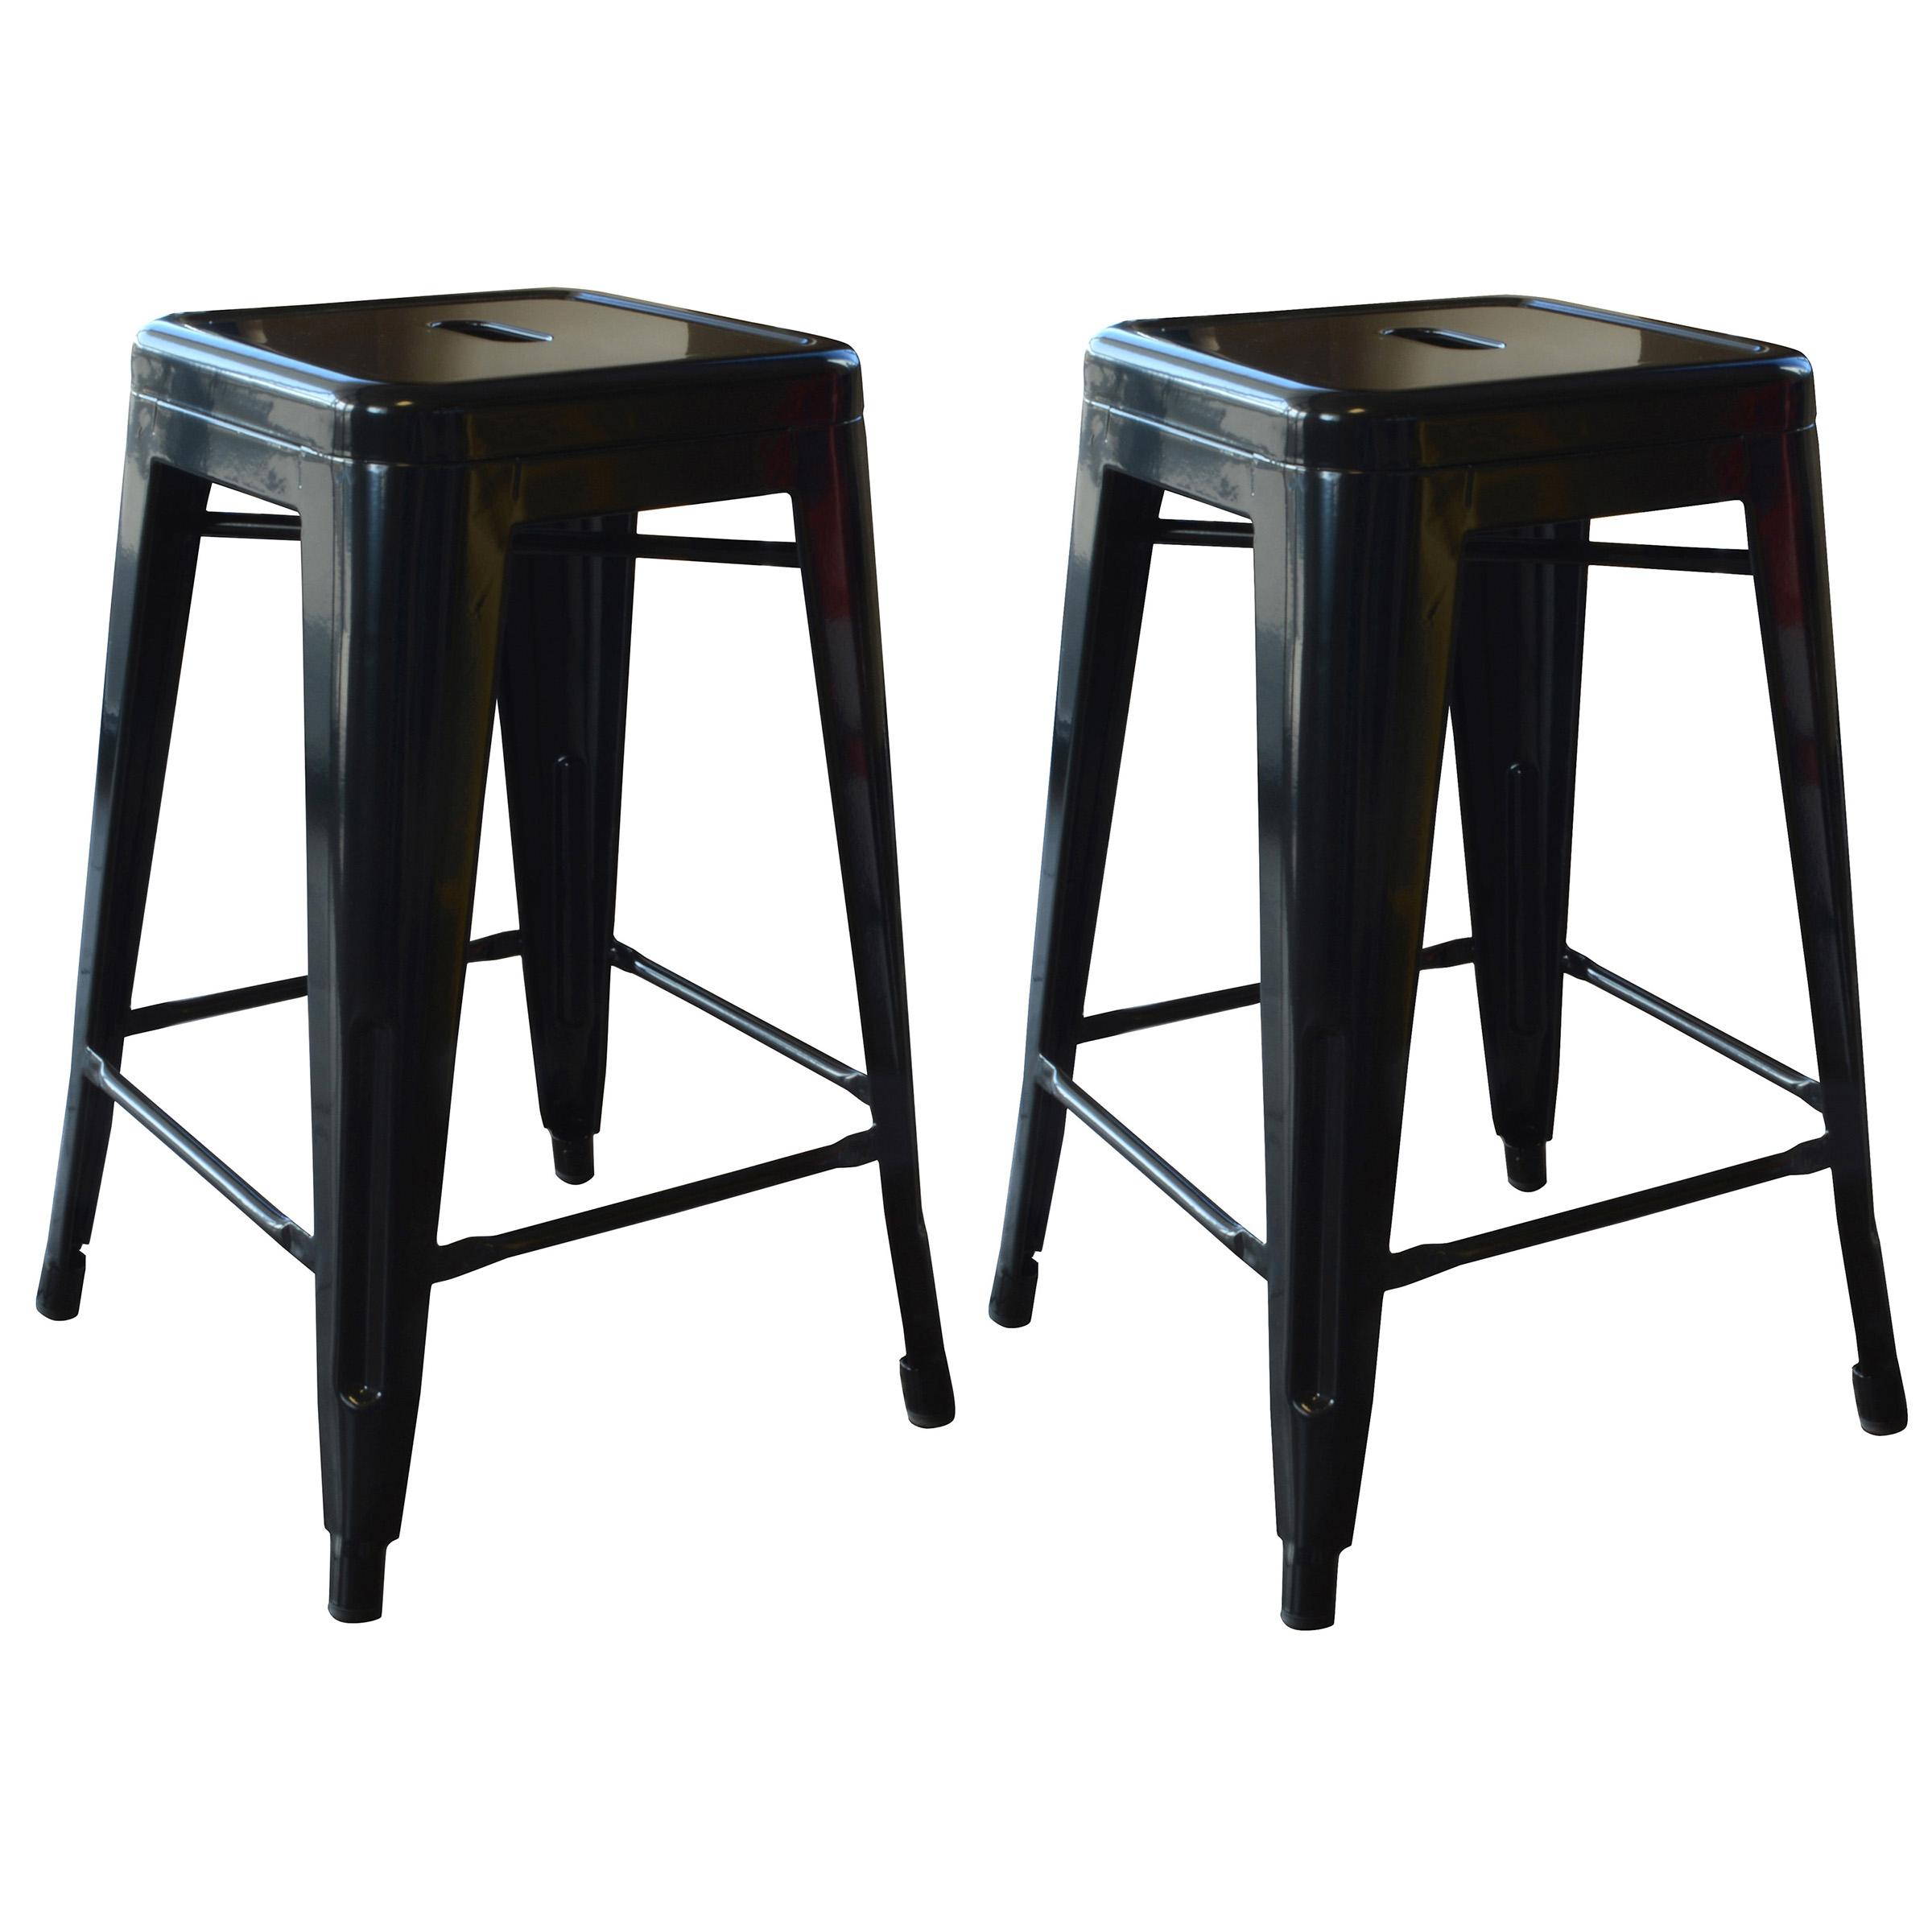 Amerihome Loft Black 24 Inch Metal Bar Stool 2 Piece Walmartcom